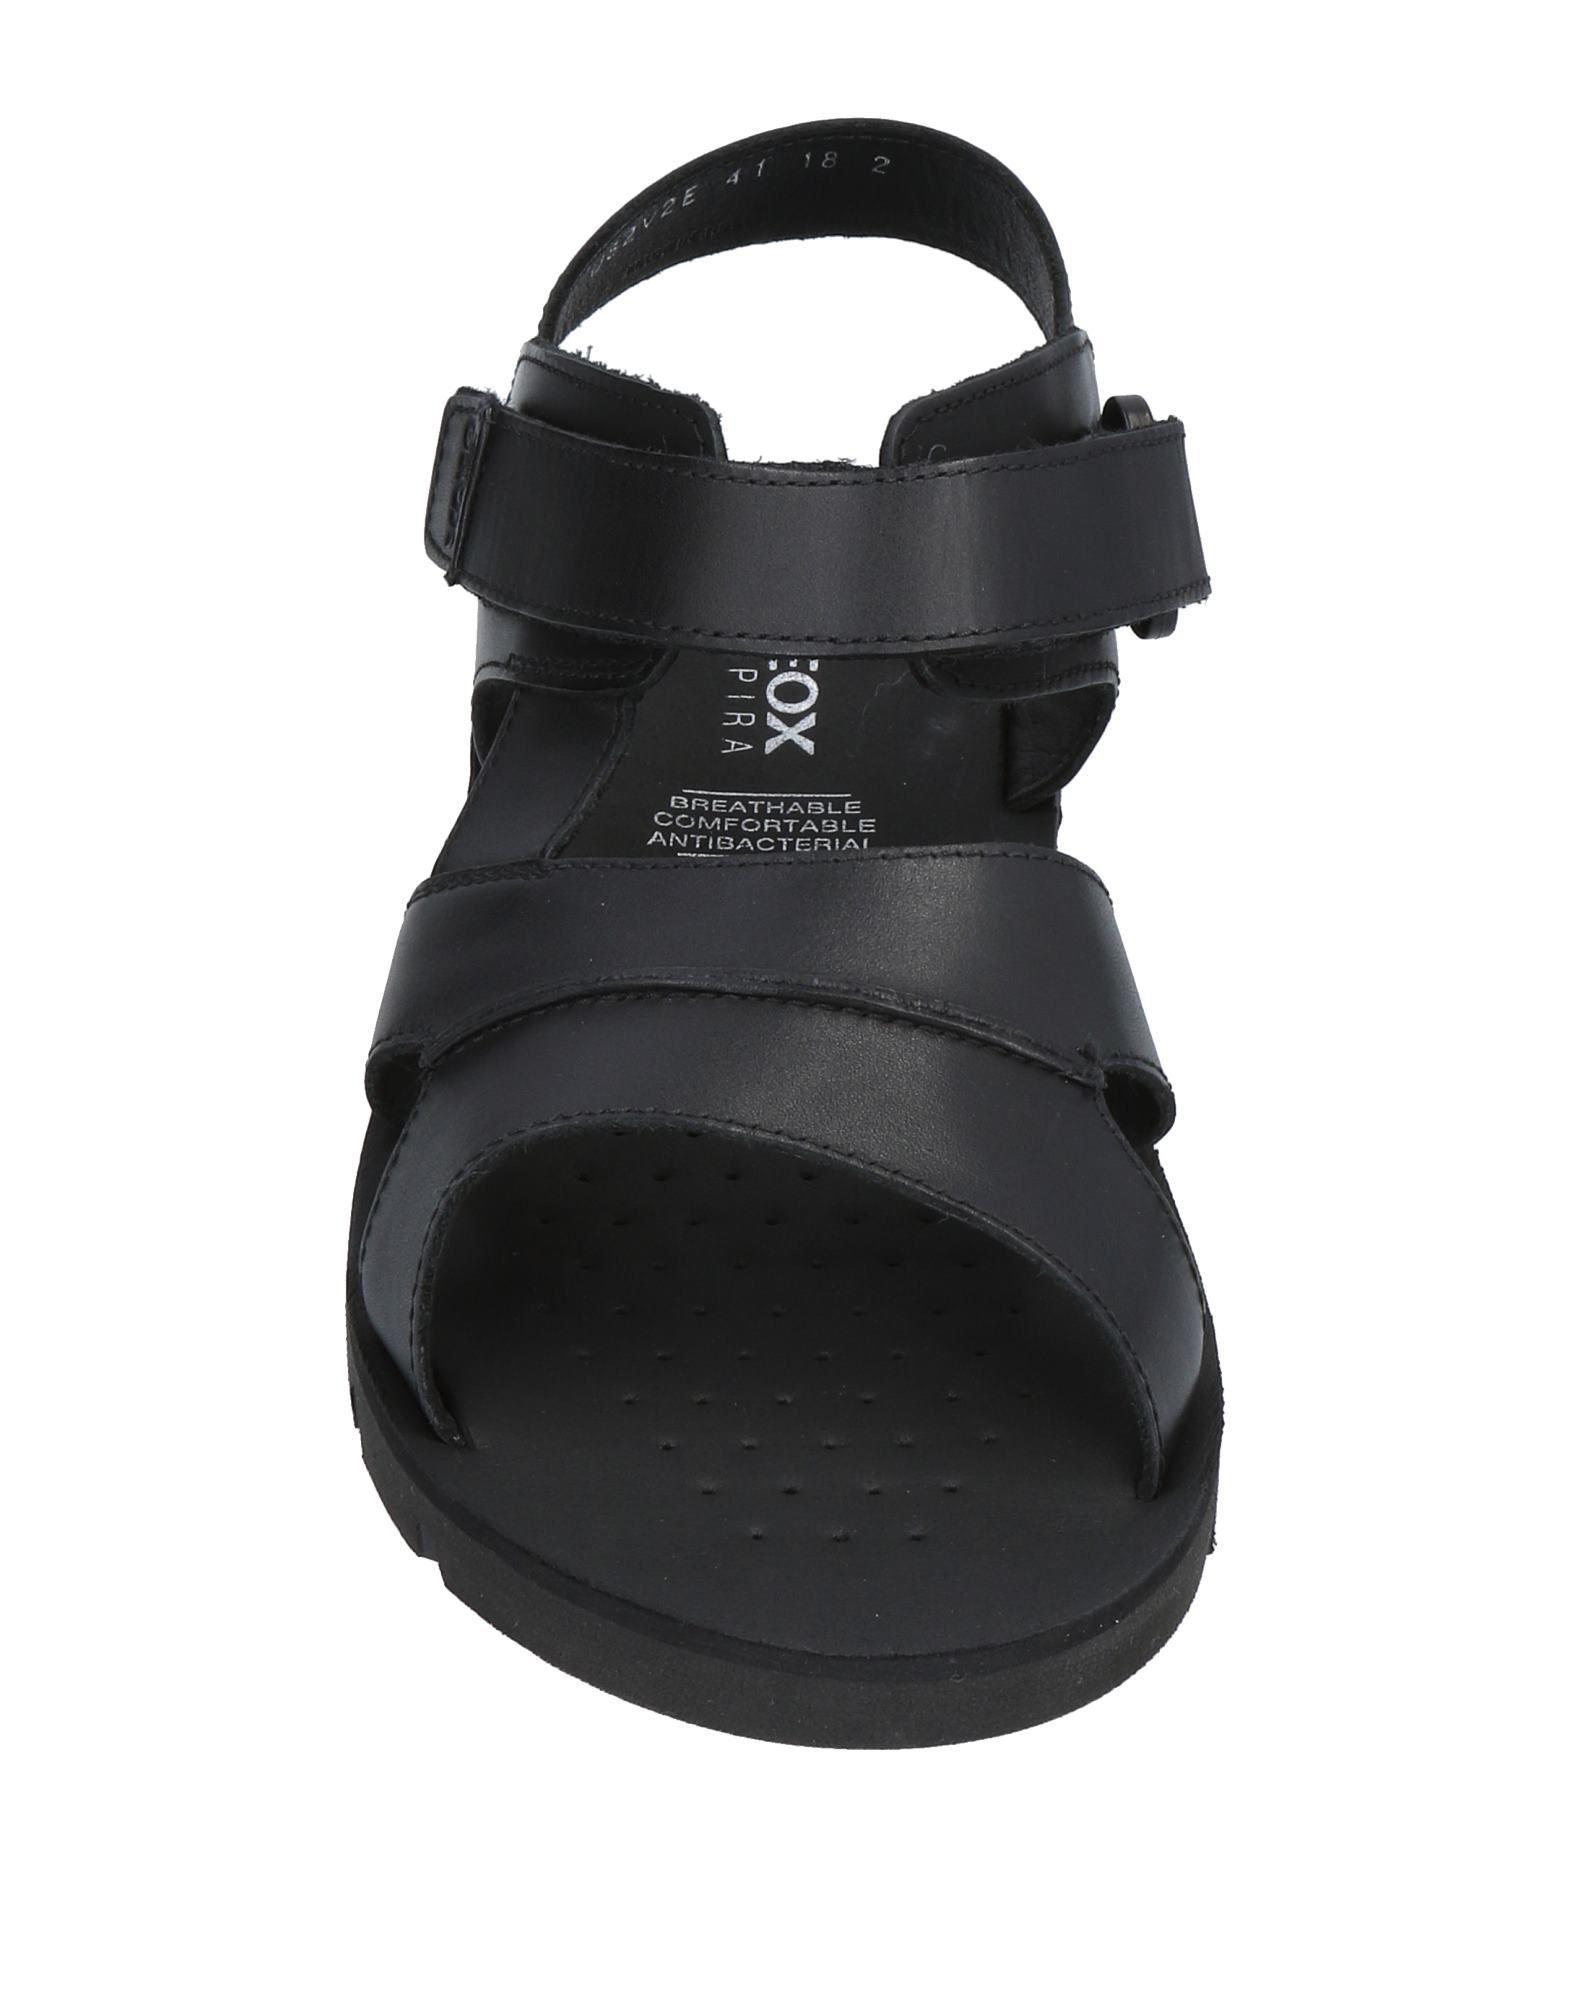 Geox Geox  Sandalen Herren  11479507MN Heiße Schuhe 9b80ad